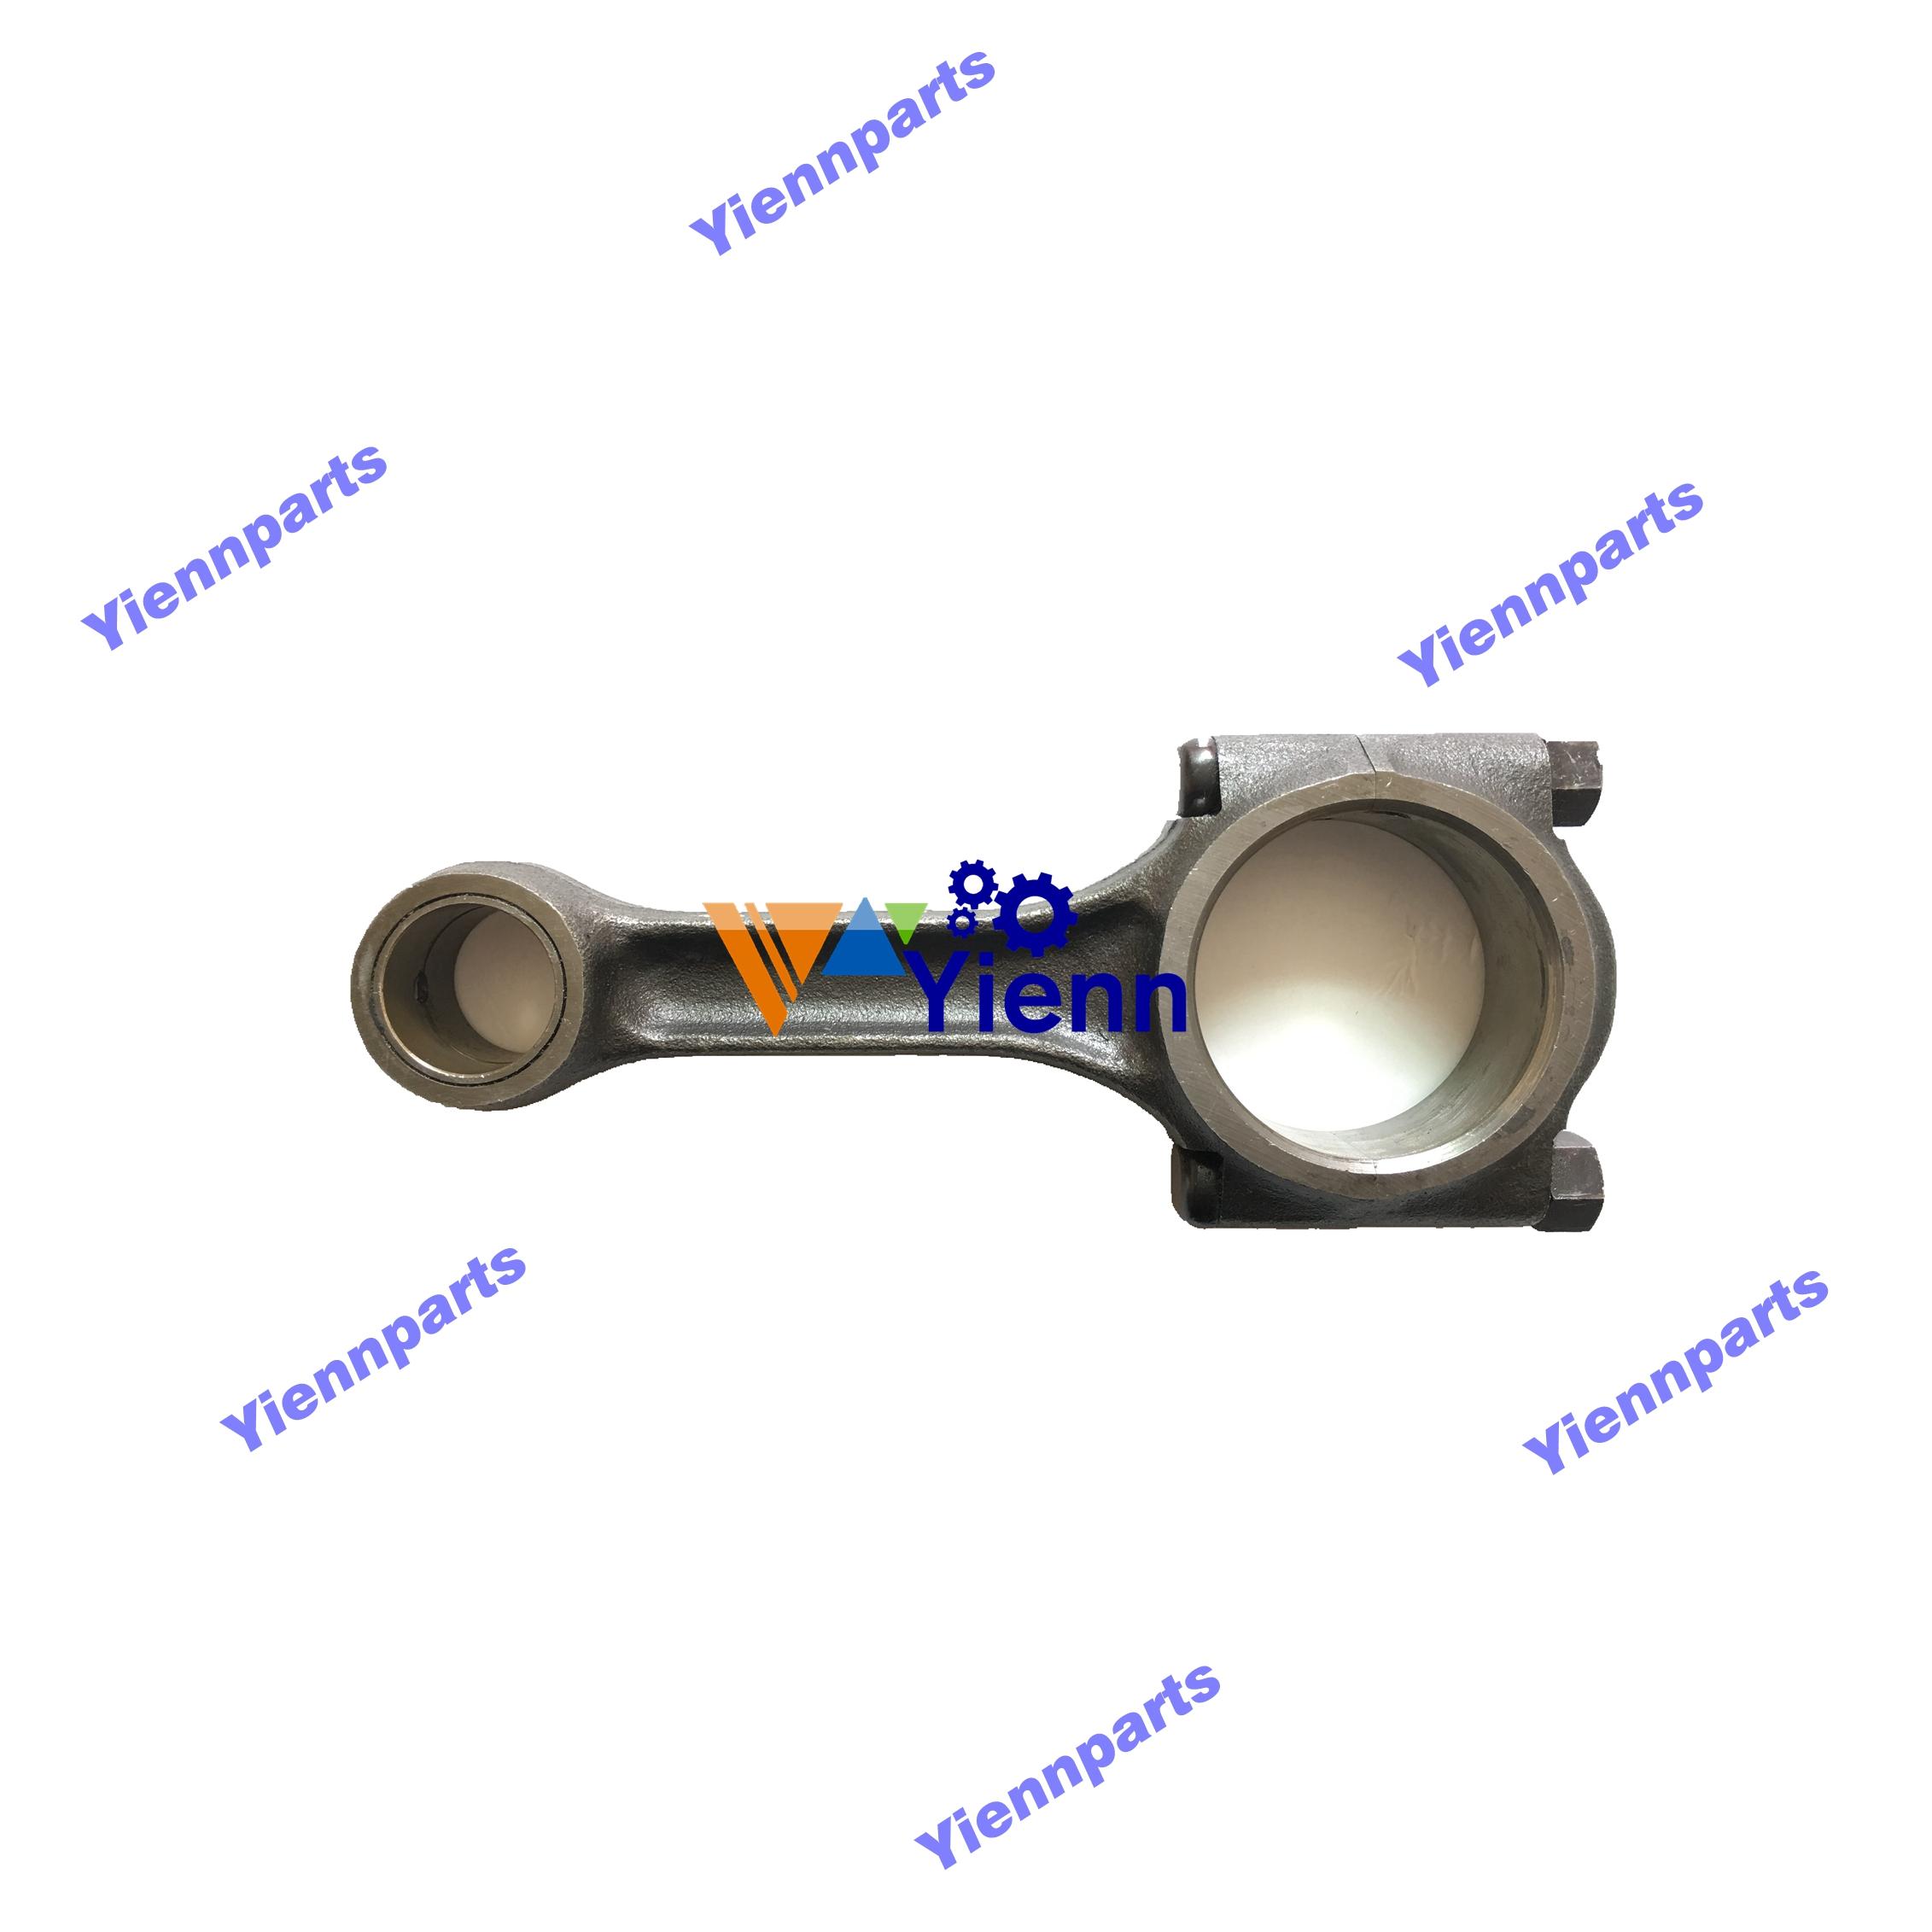 1 piece STD Connecting Rod for yanmar 4D88 4TNE88 4TNV88 Engine